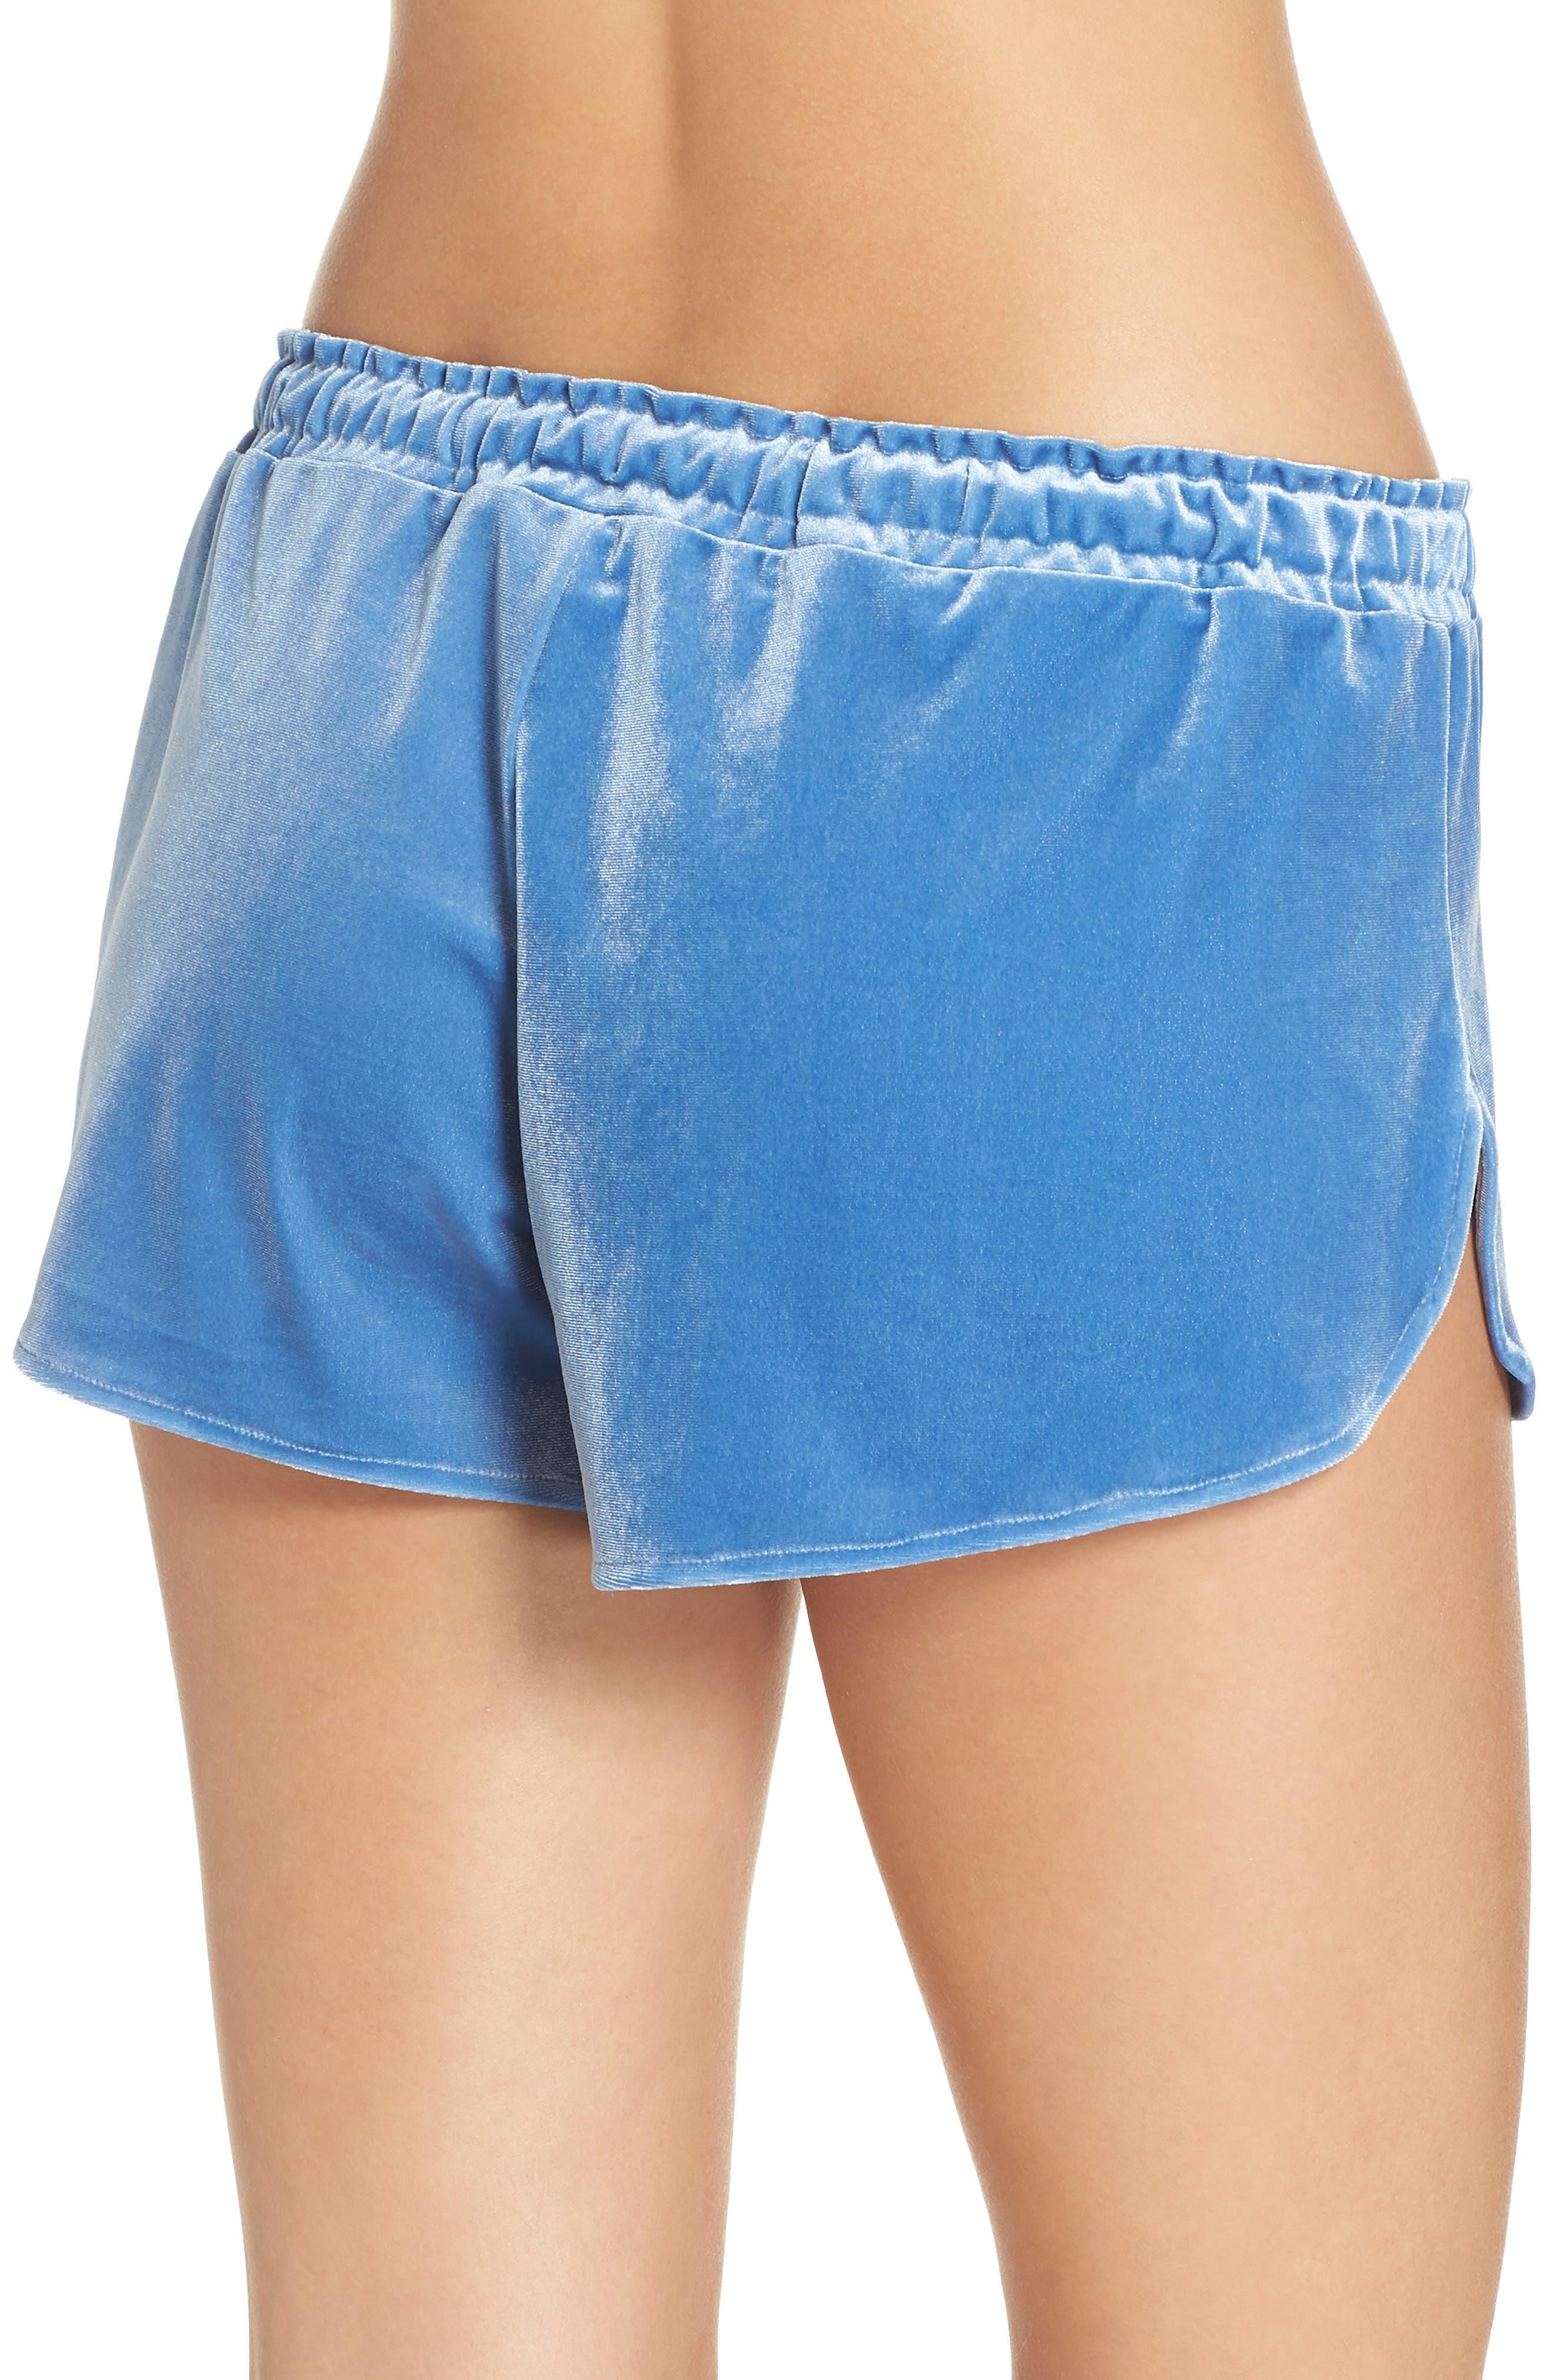 Starry Night Velvet Pajama Shorts,                             Alternate thumbnail 2, color,                             BLUE DELFT